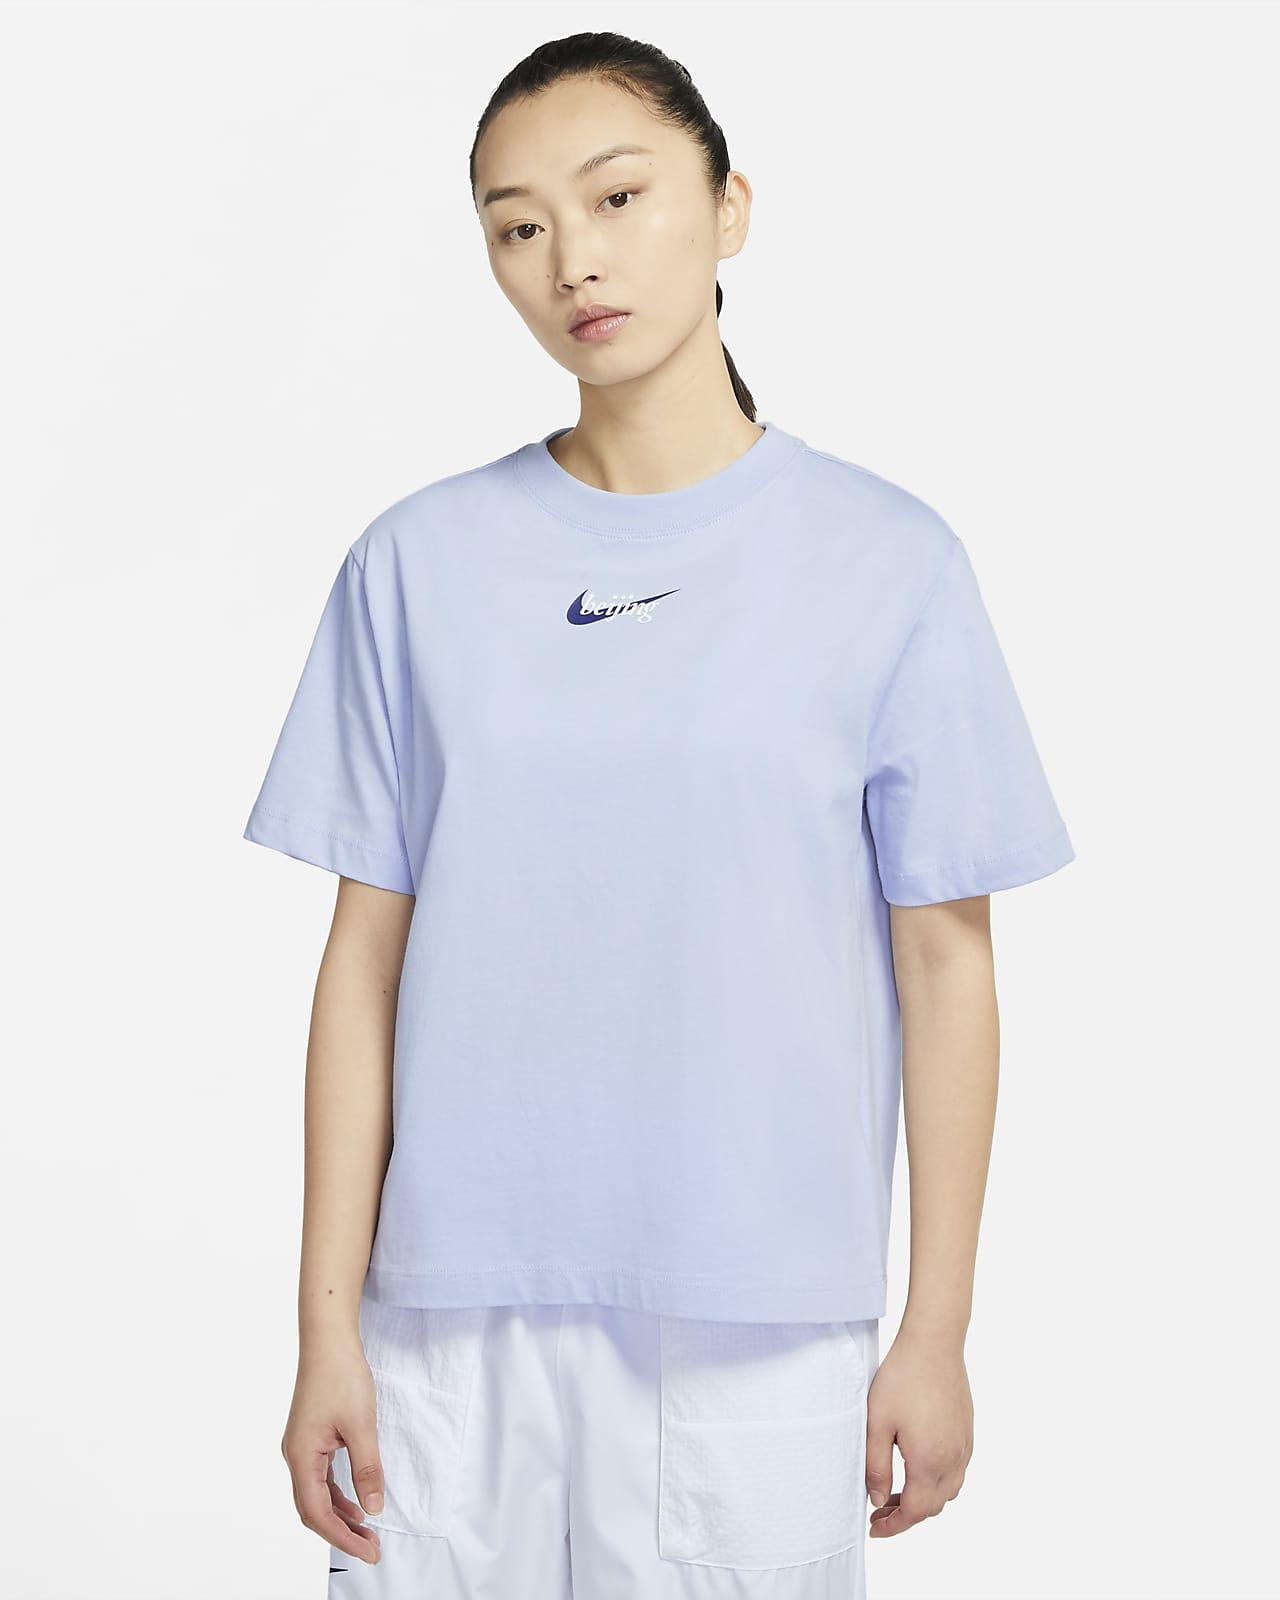 Nike Sportswear 女子短袖T恤